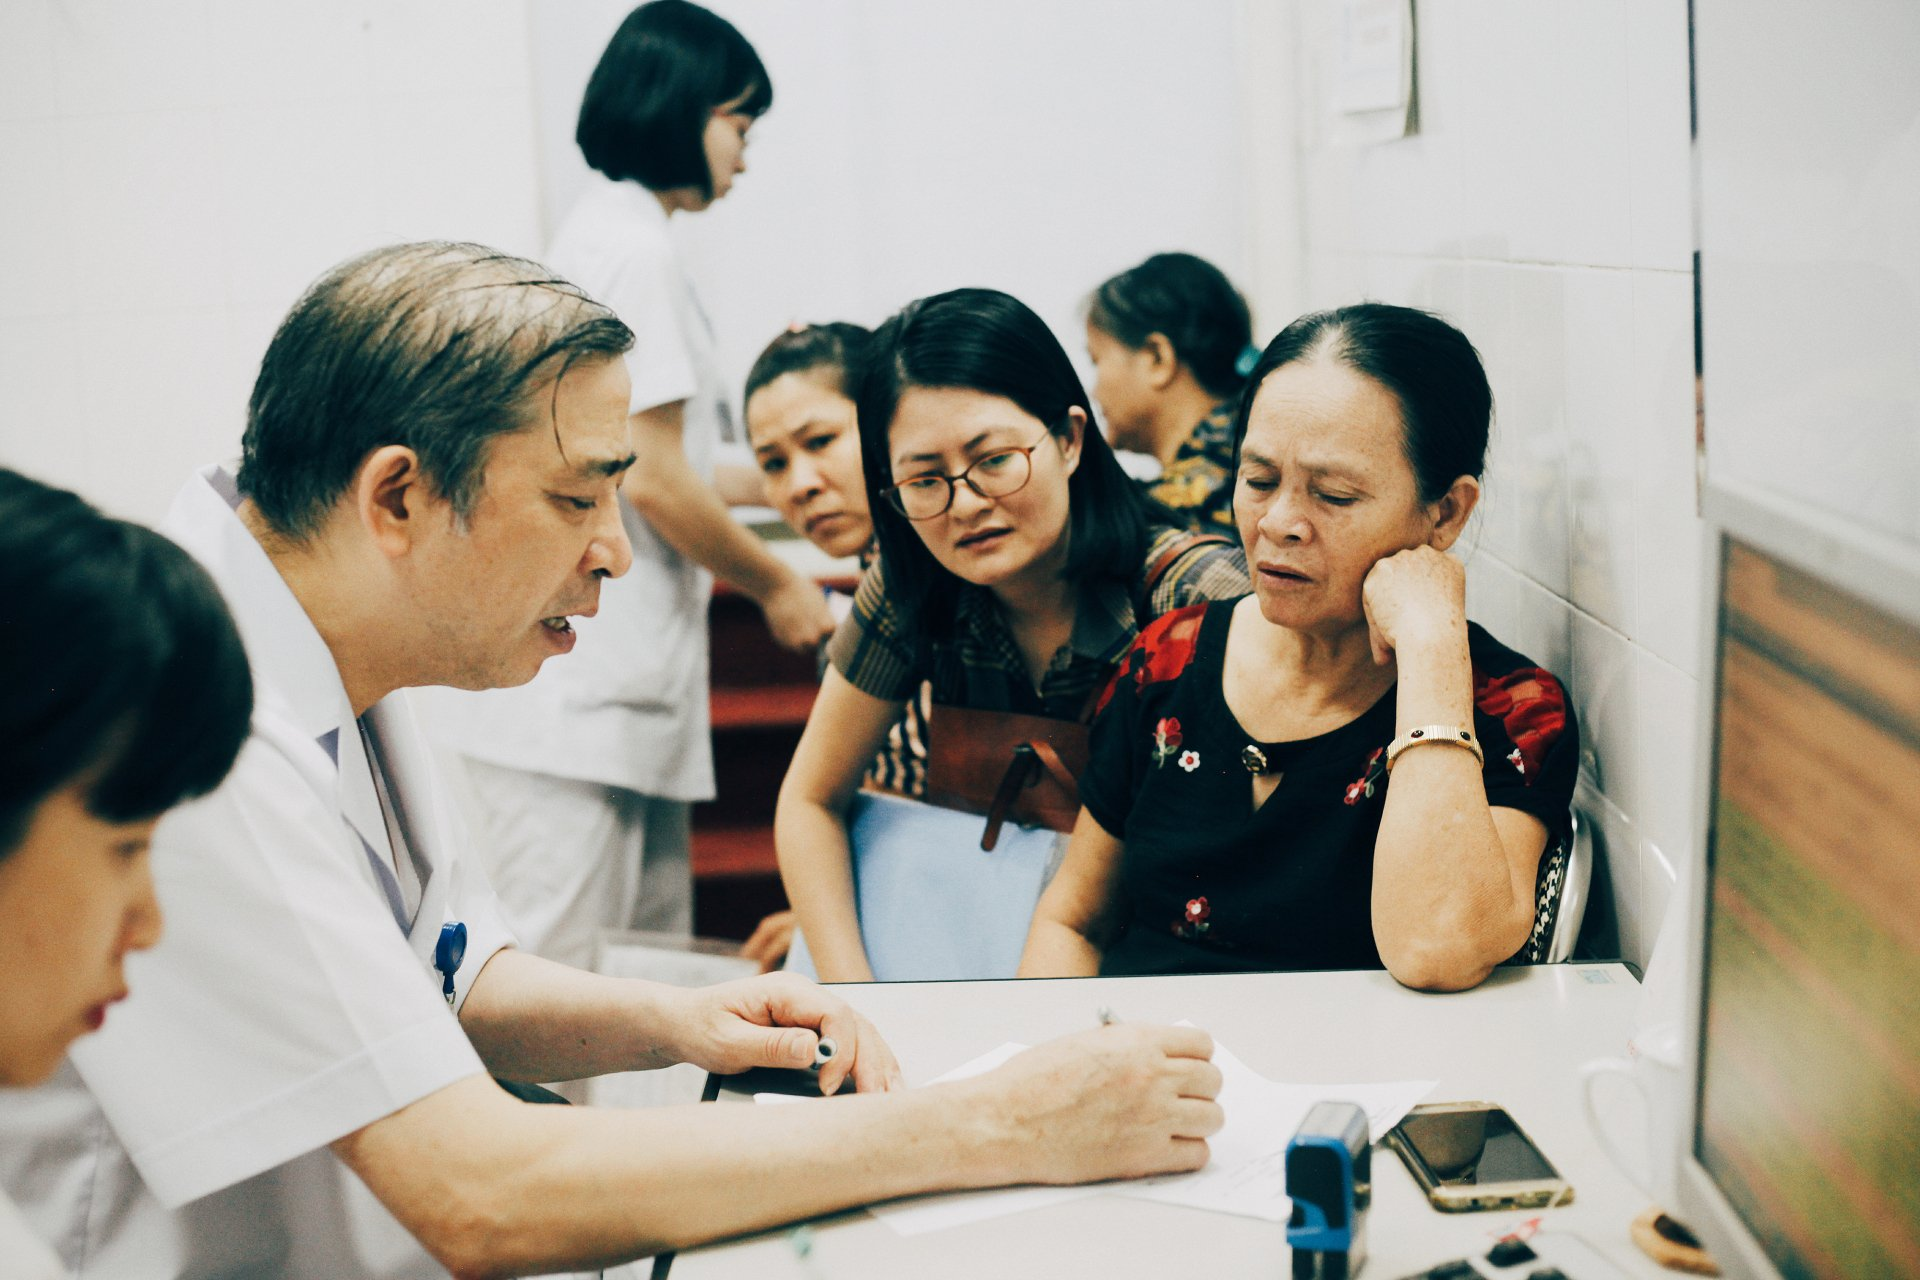 Giam doc Benh vien Phu san Trung uong bat mi hang loat chuyen 'lam dep cho phu nu' hinh anh 4